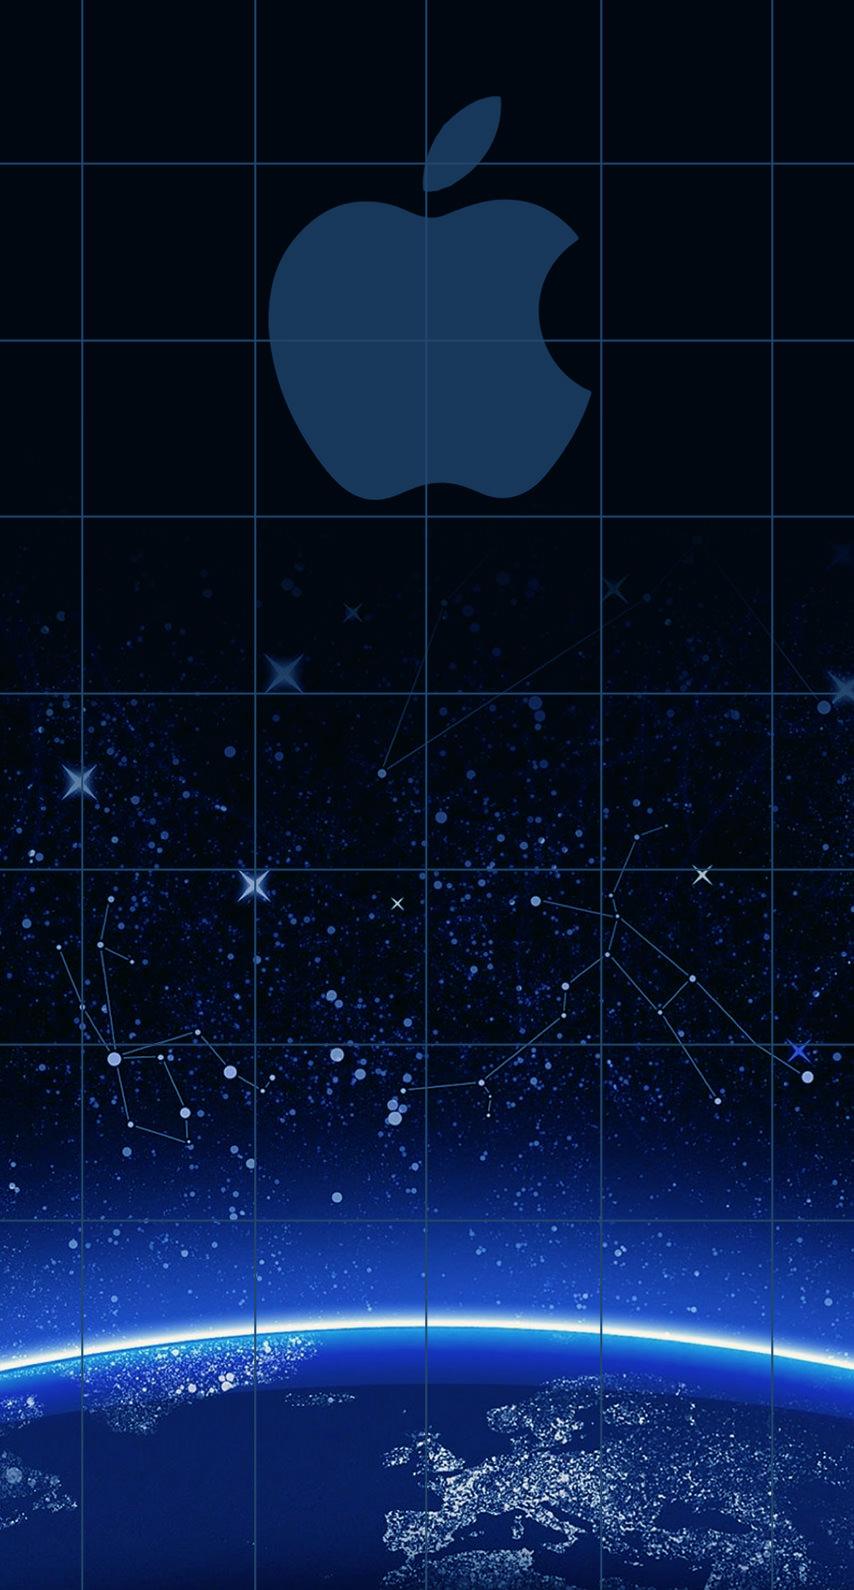 Green Wallpaper Iphone X Apple Logo Shelf Cool Blue Universe Wallpaper Sc Iphone6s